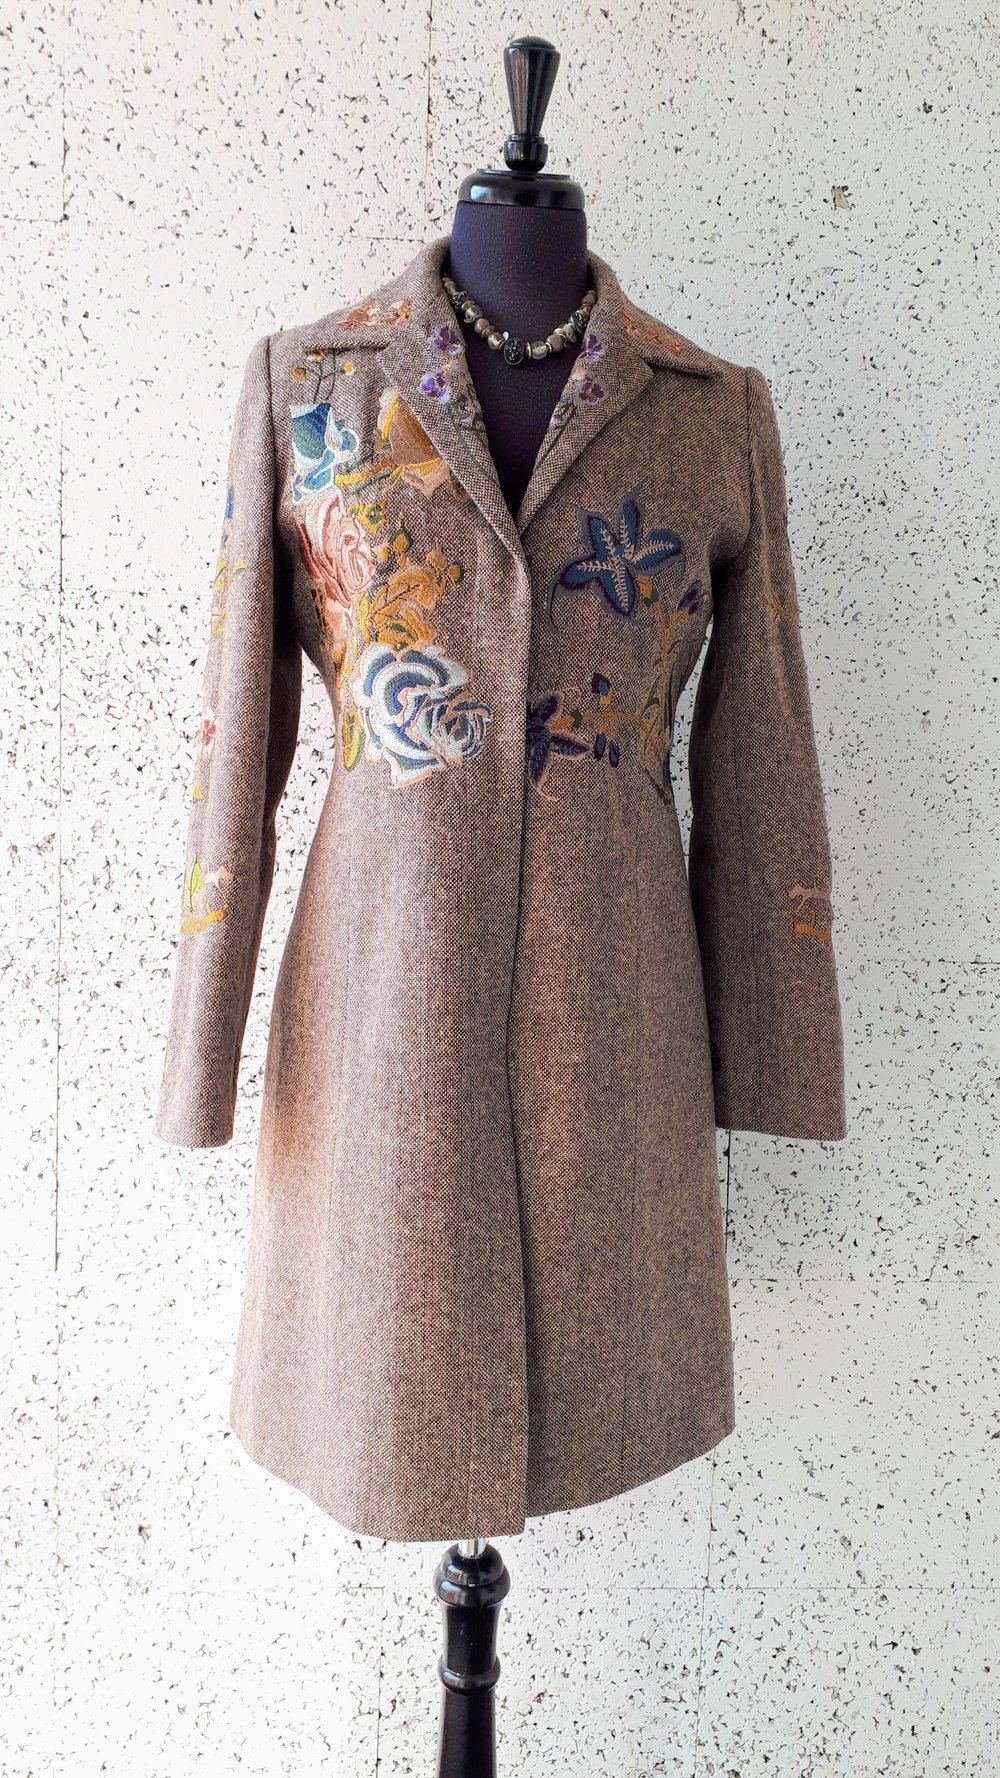 Simply Manankin coat; Size M, $48